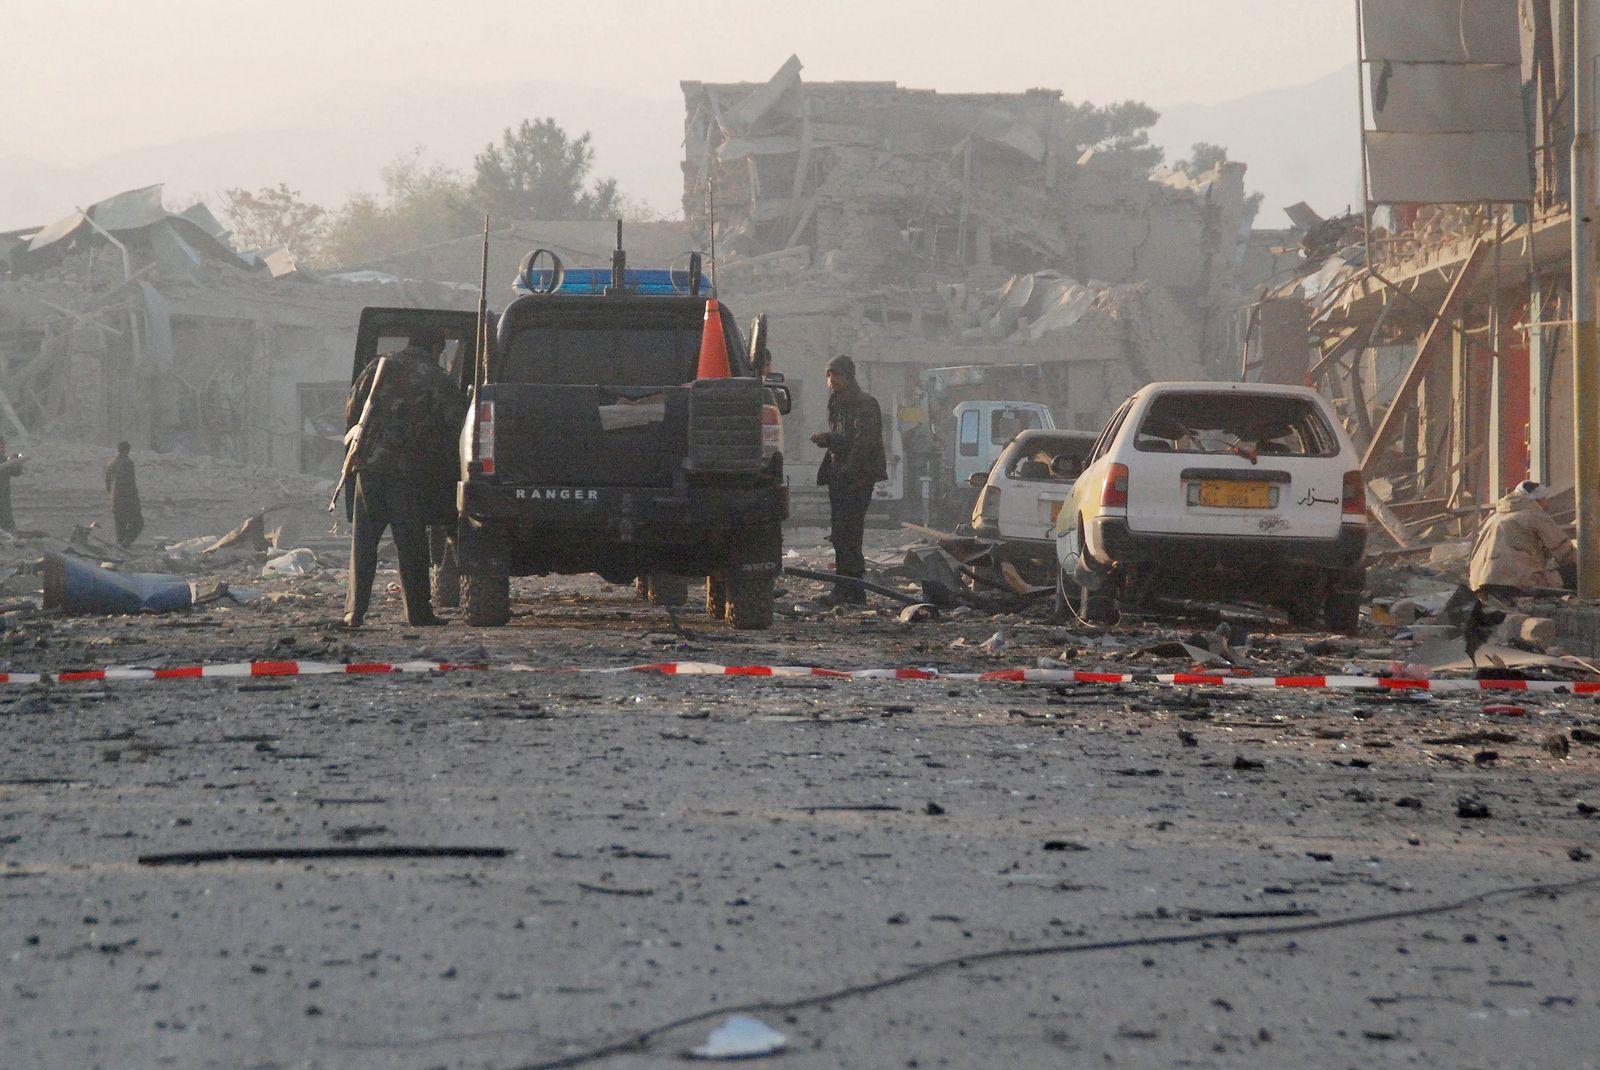 Taliban attacked German consulate in Mazar-e-Sharif